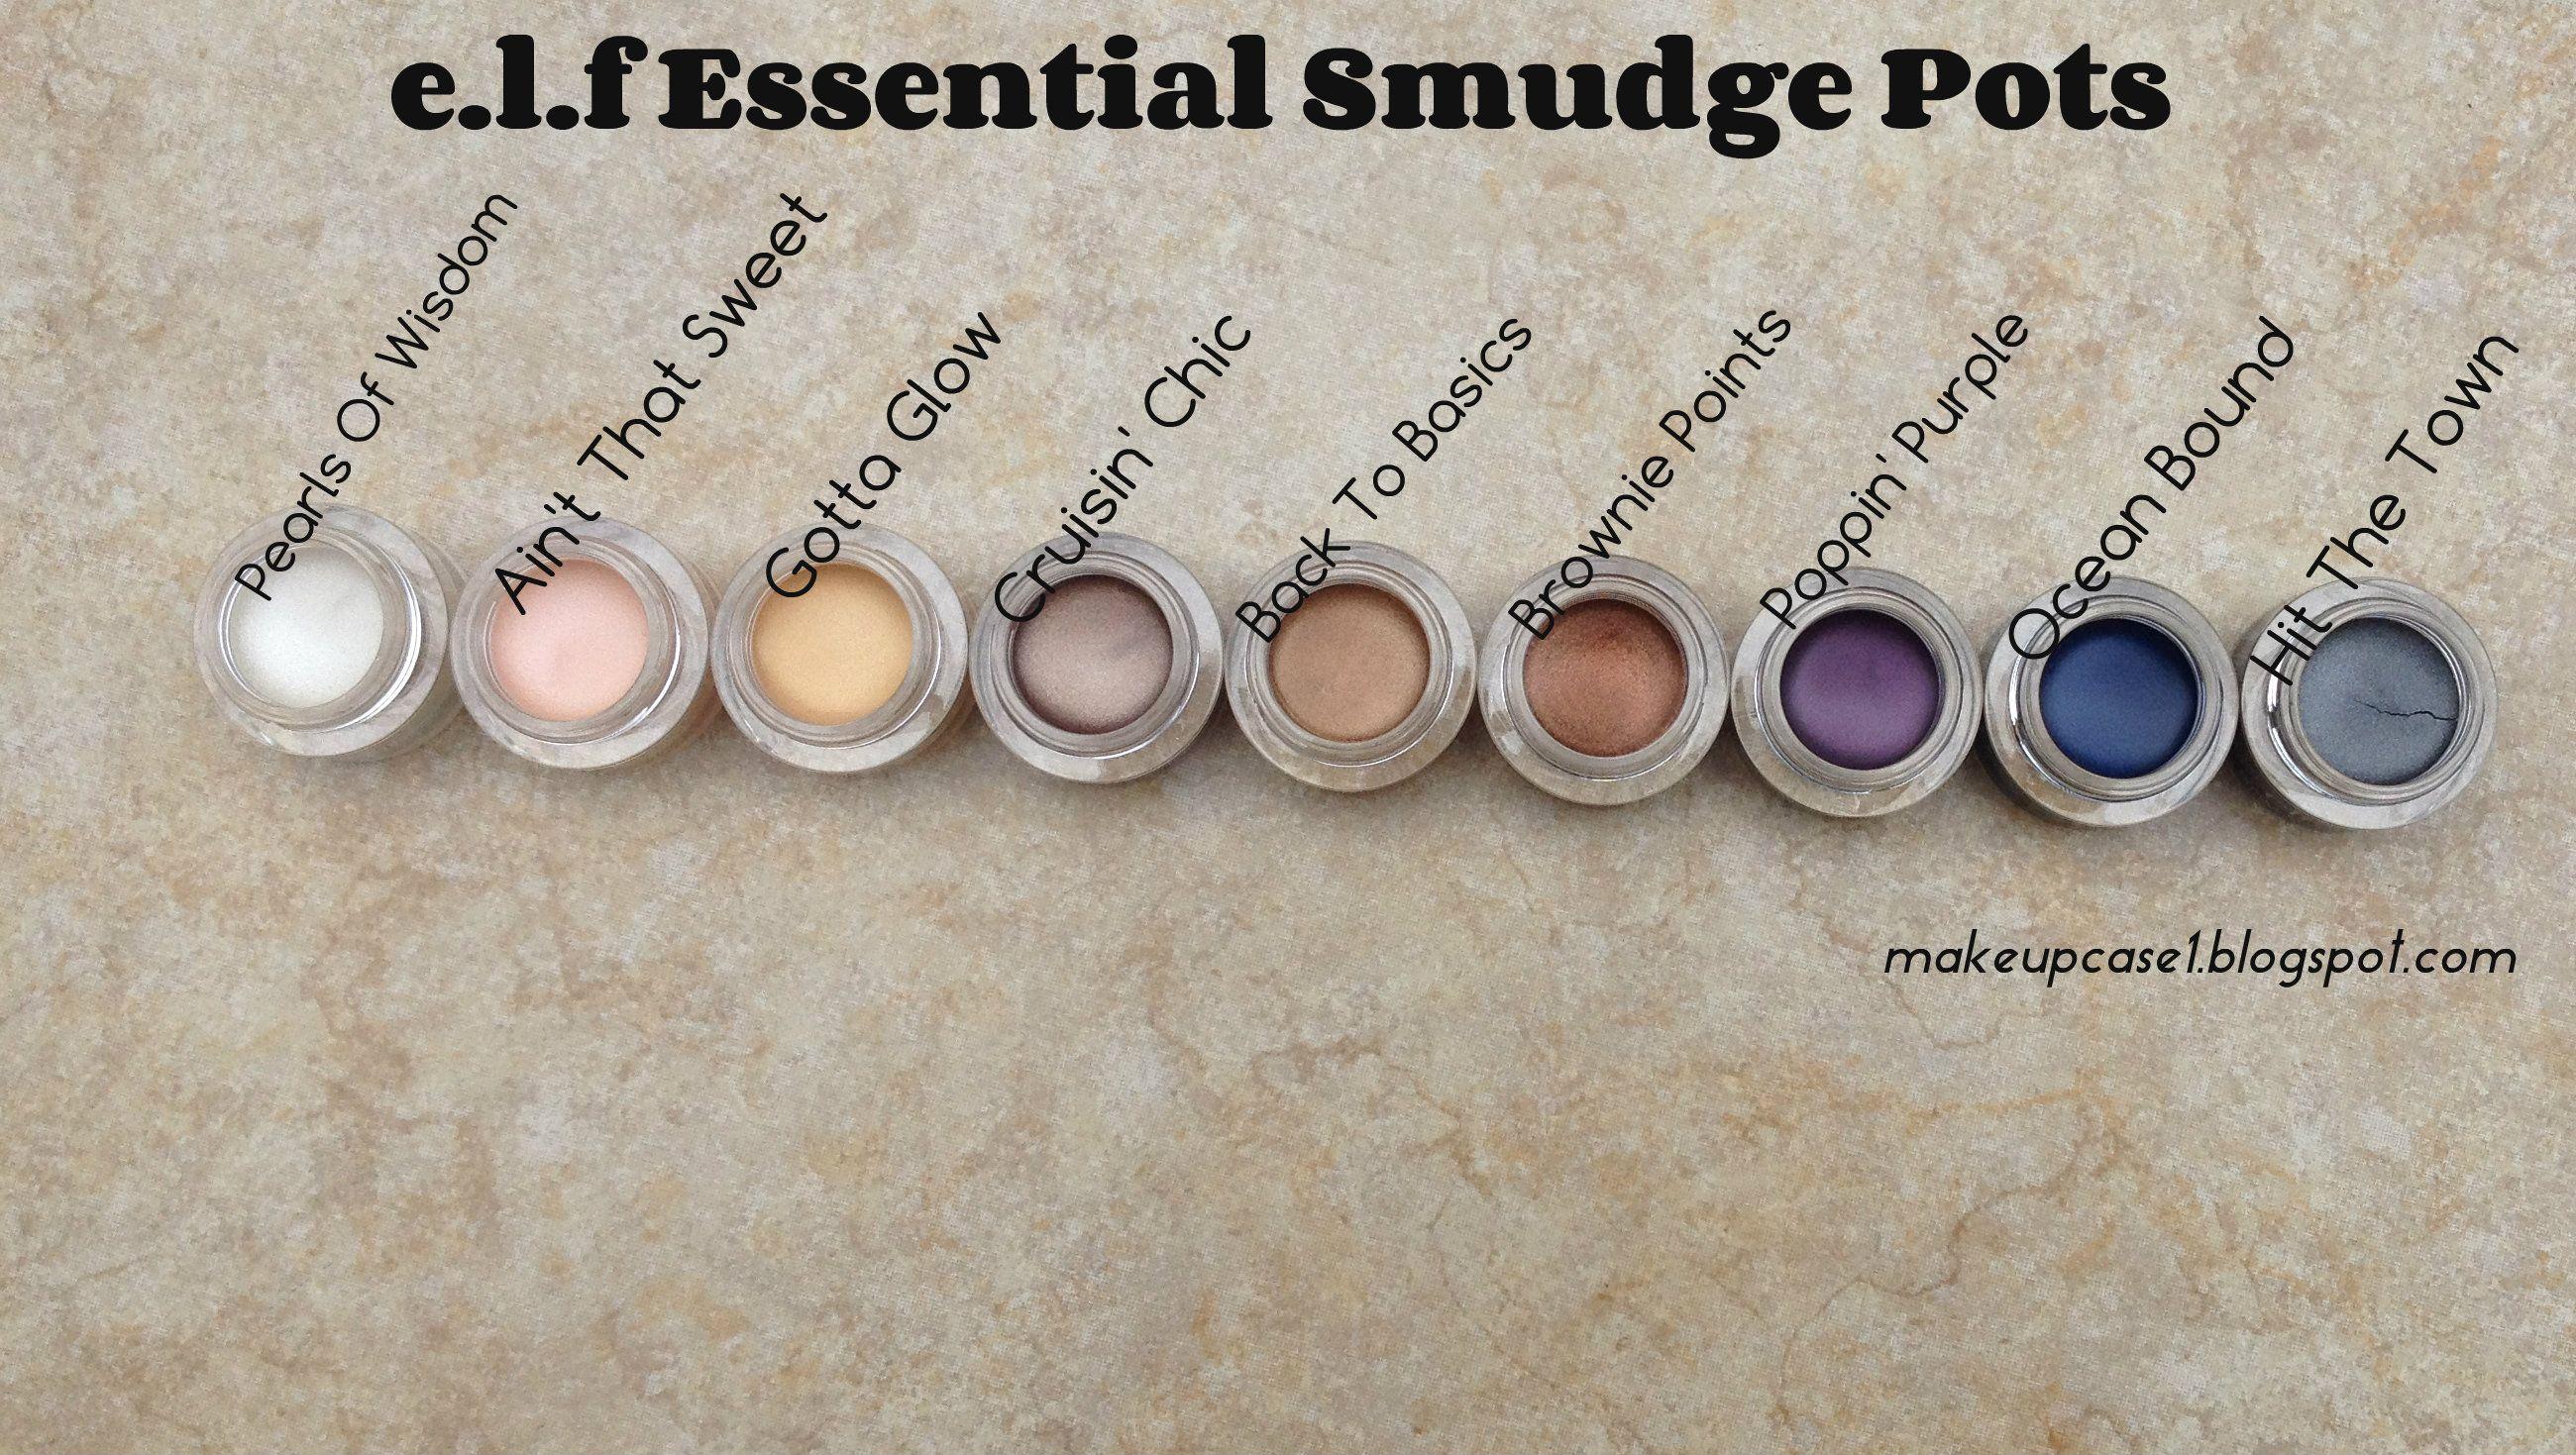 e.l.f Essential Smudge Pots Makeup obsession, Makeup